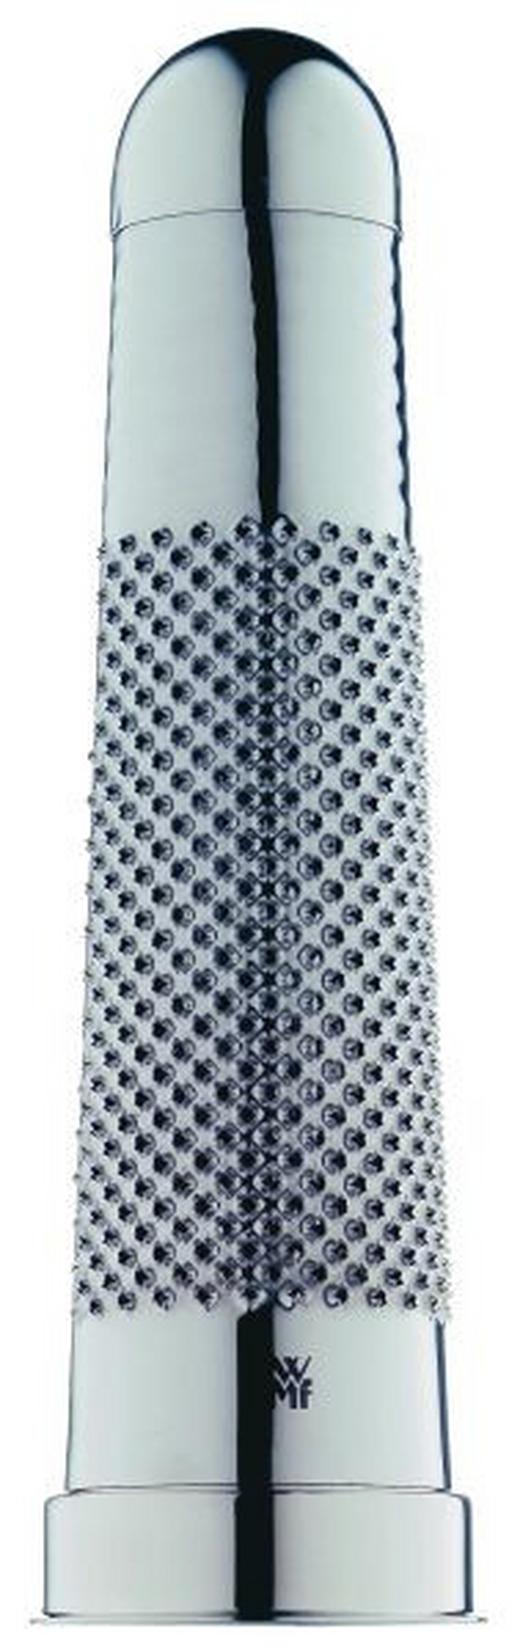 MUSKATREIBE - Basics, Metall (16,5cm) - WMF